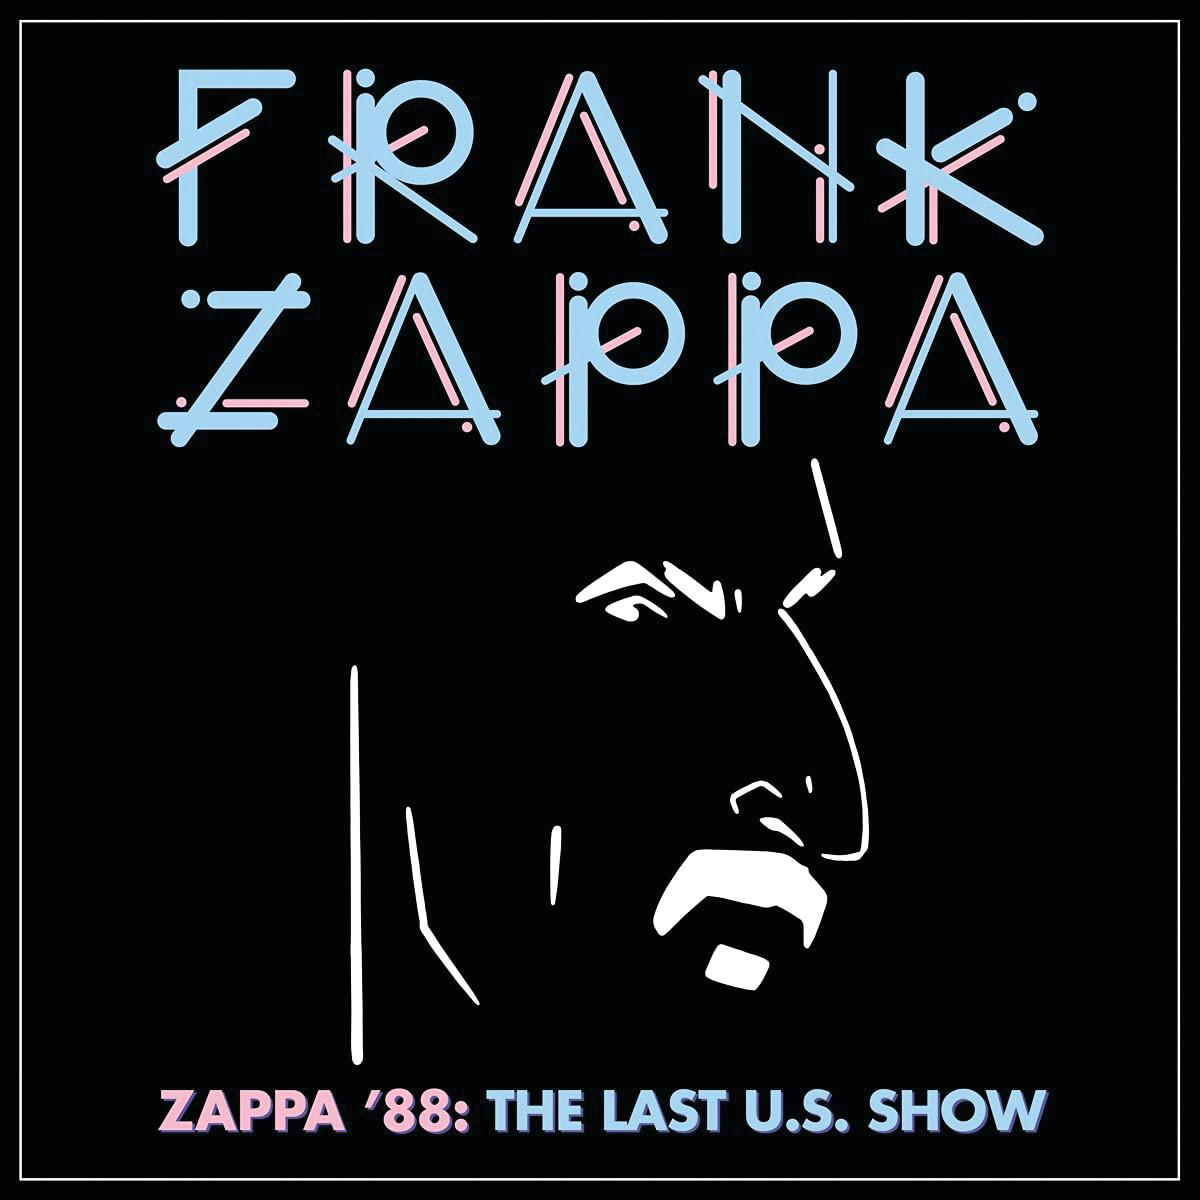 Frank Zappa88